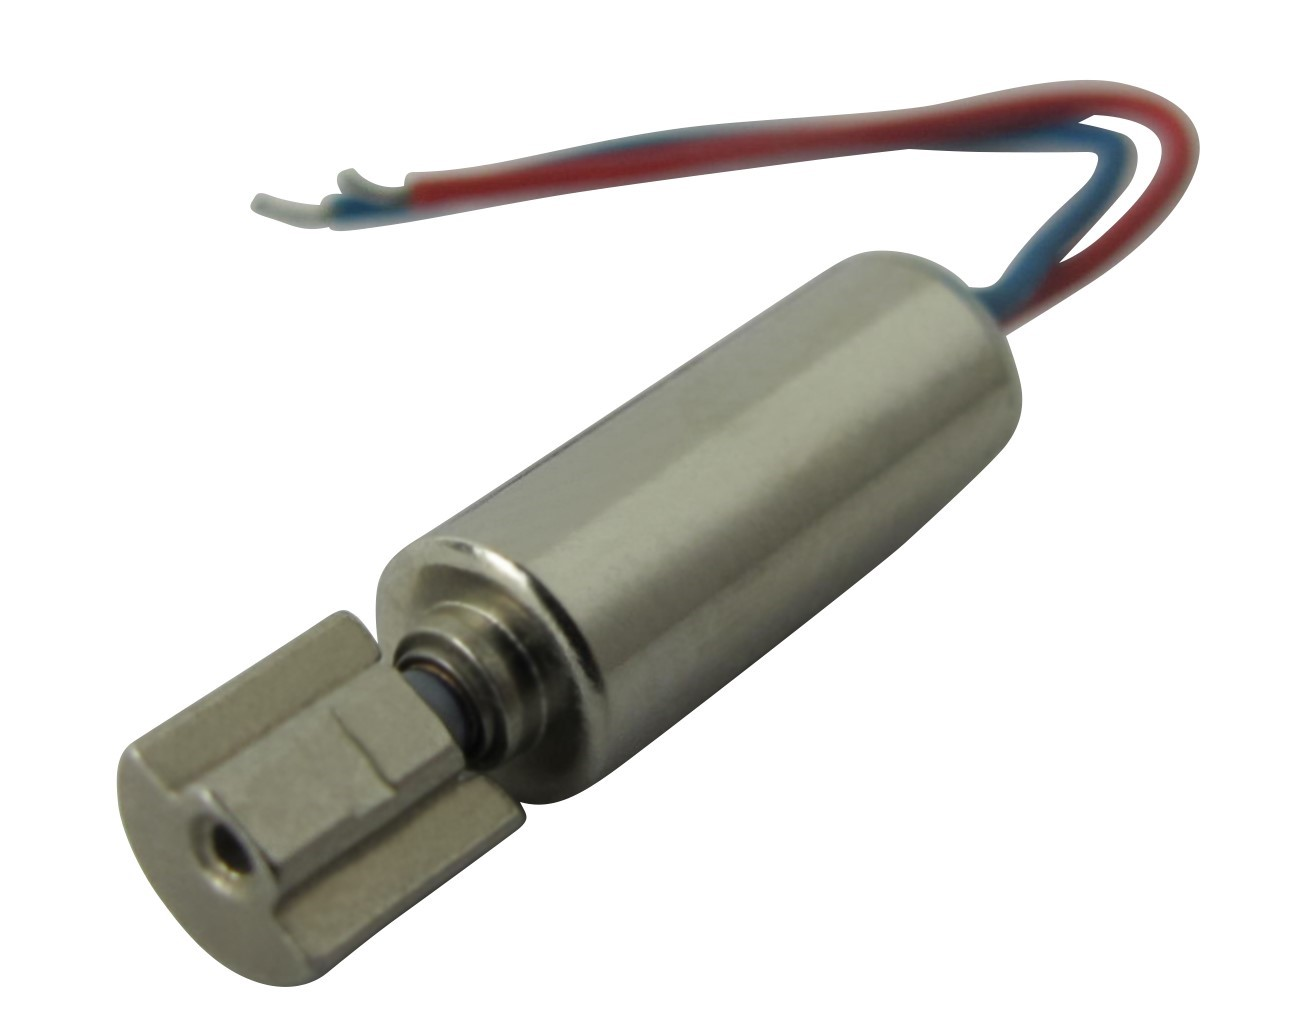 Z4SL2A0270001 Cylindrical Vibrator Motor